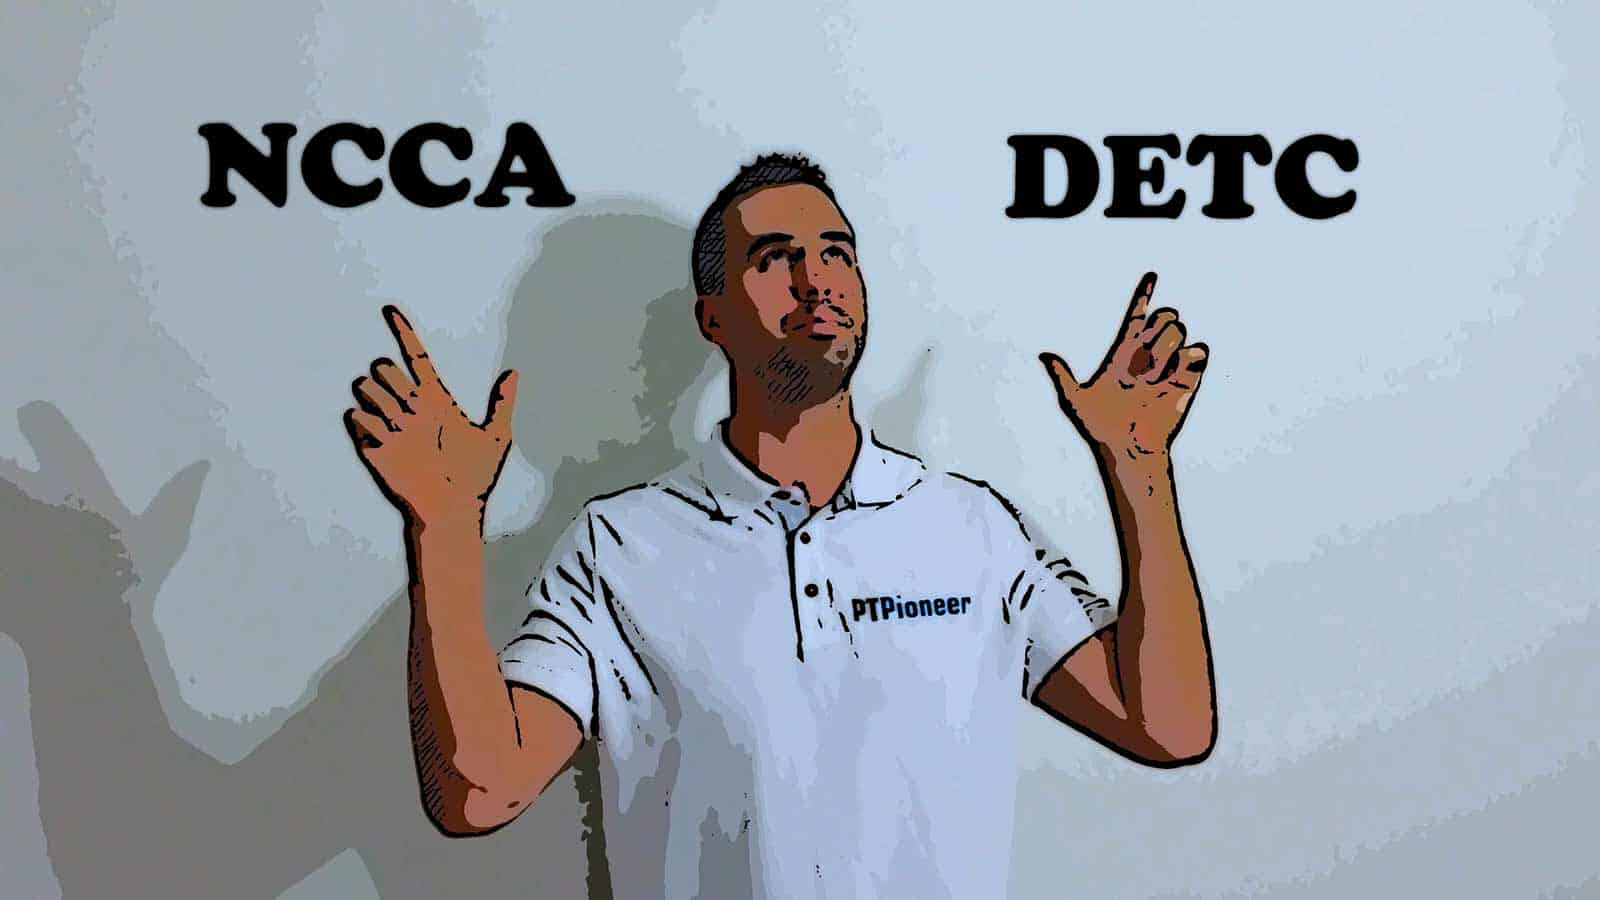 NCCA or DETC